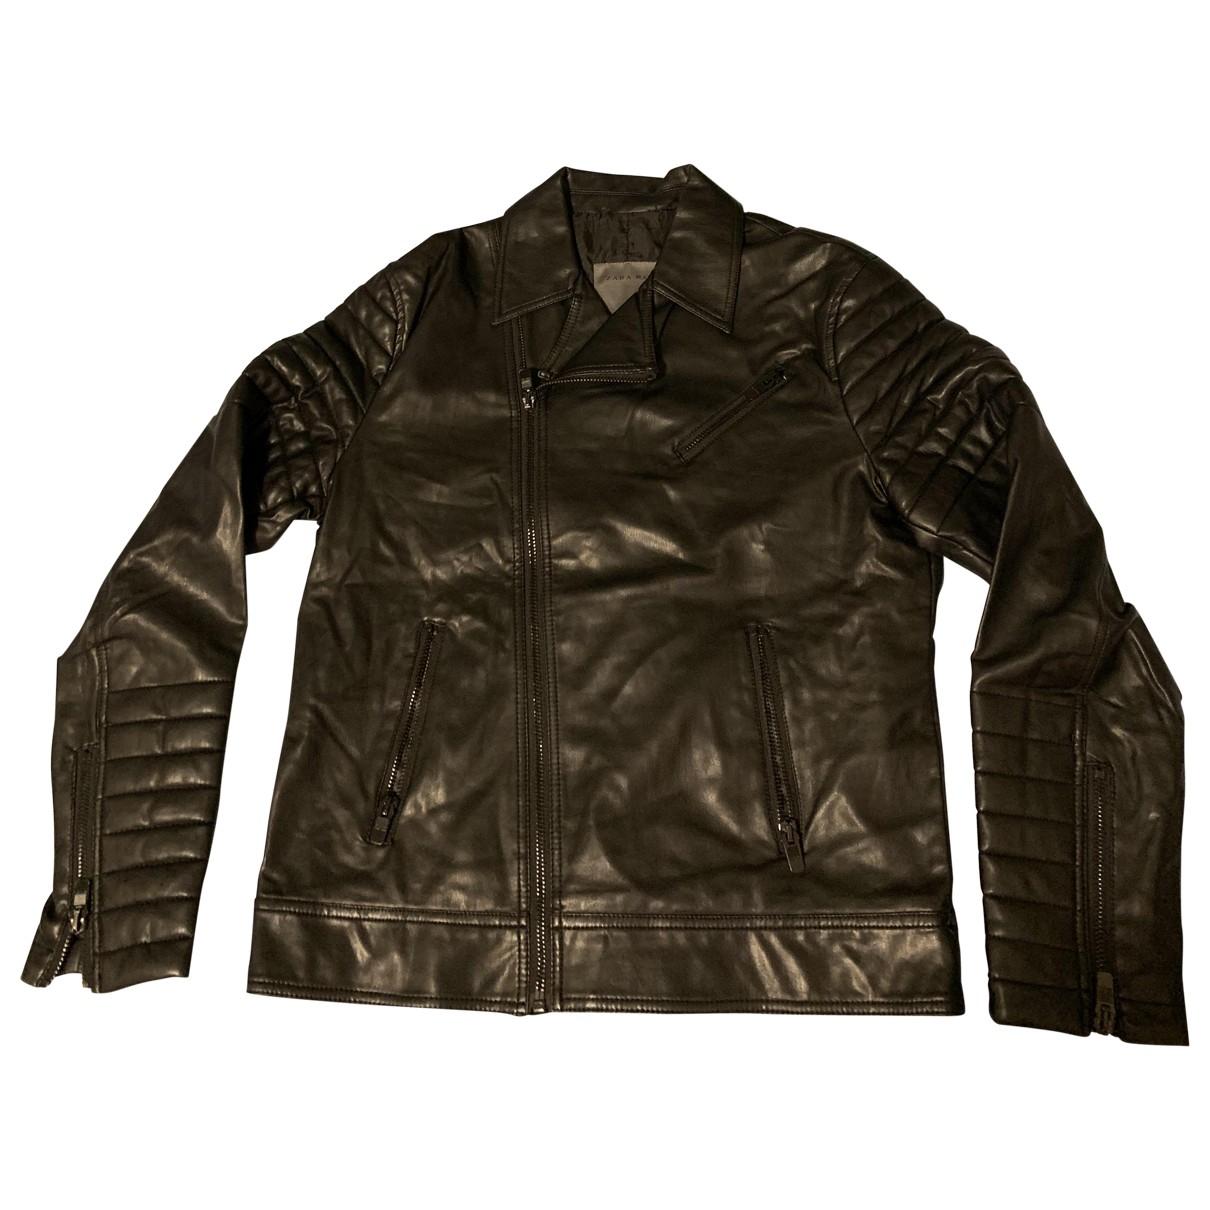 Zara \N Black Leather jacket  for Men XL International